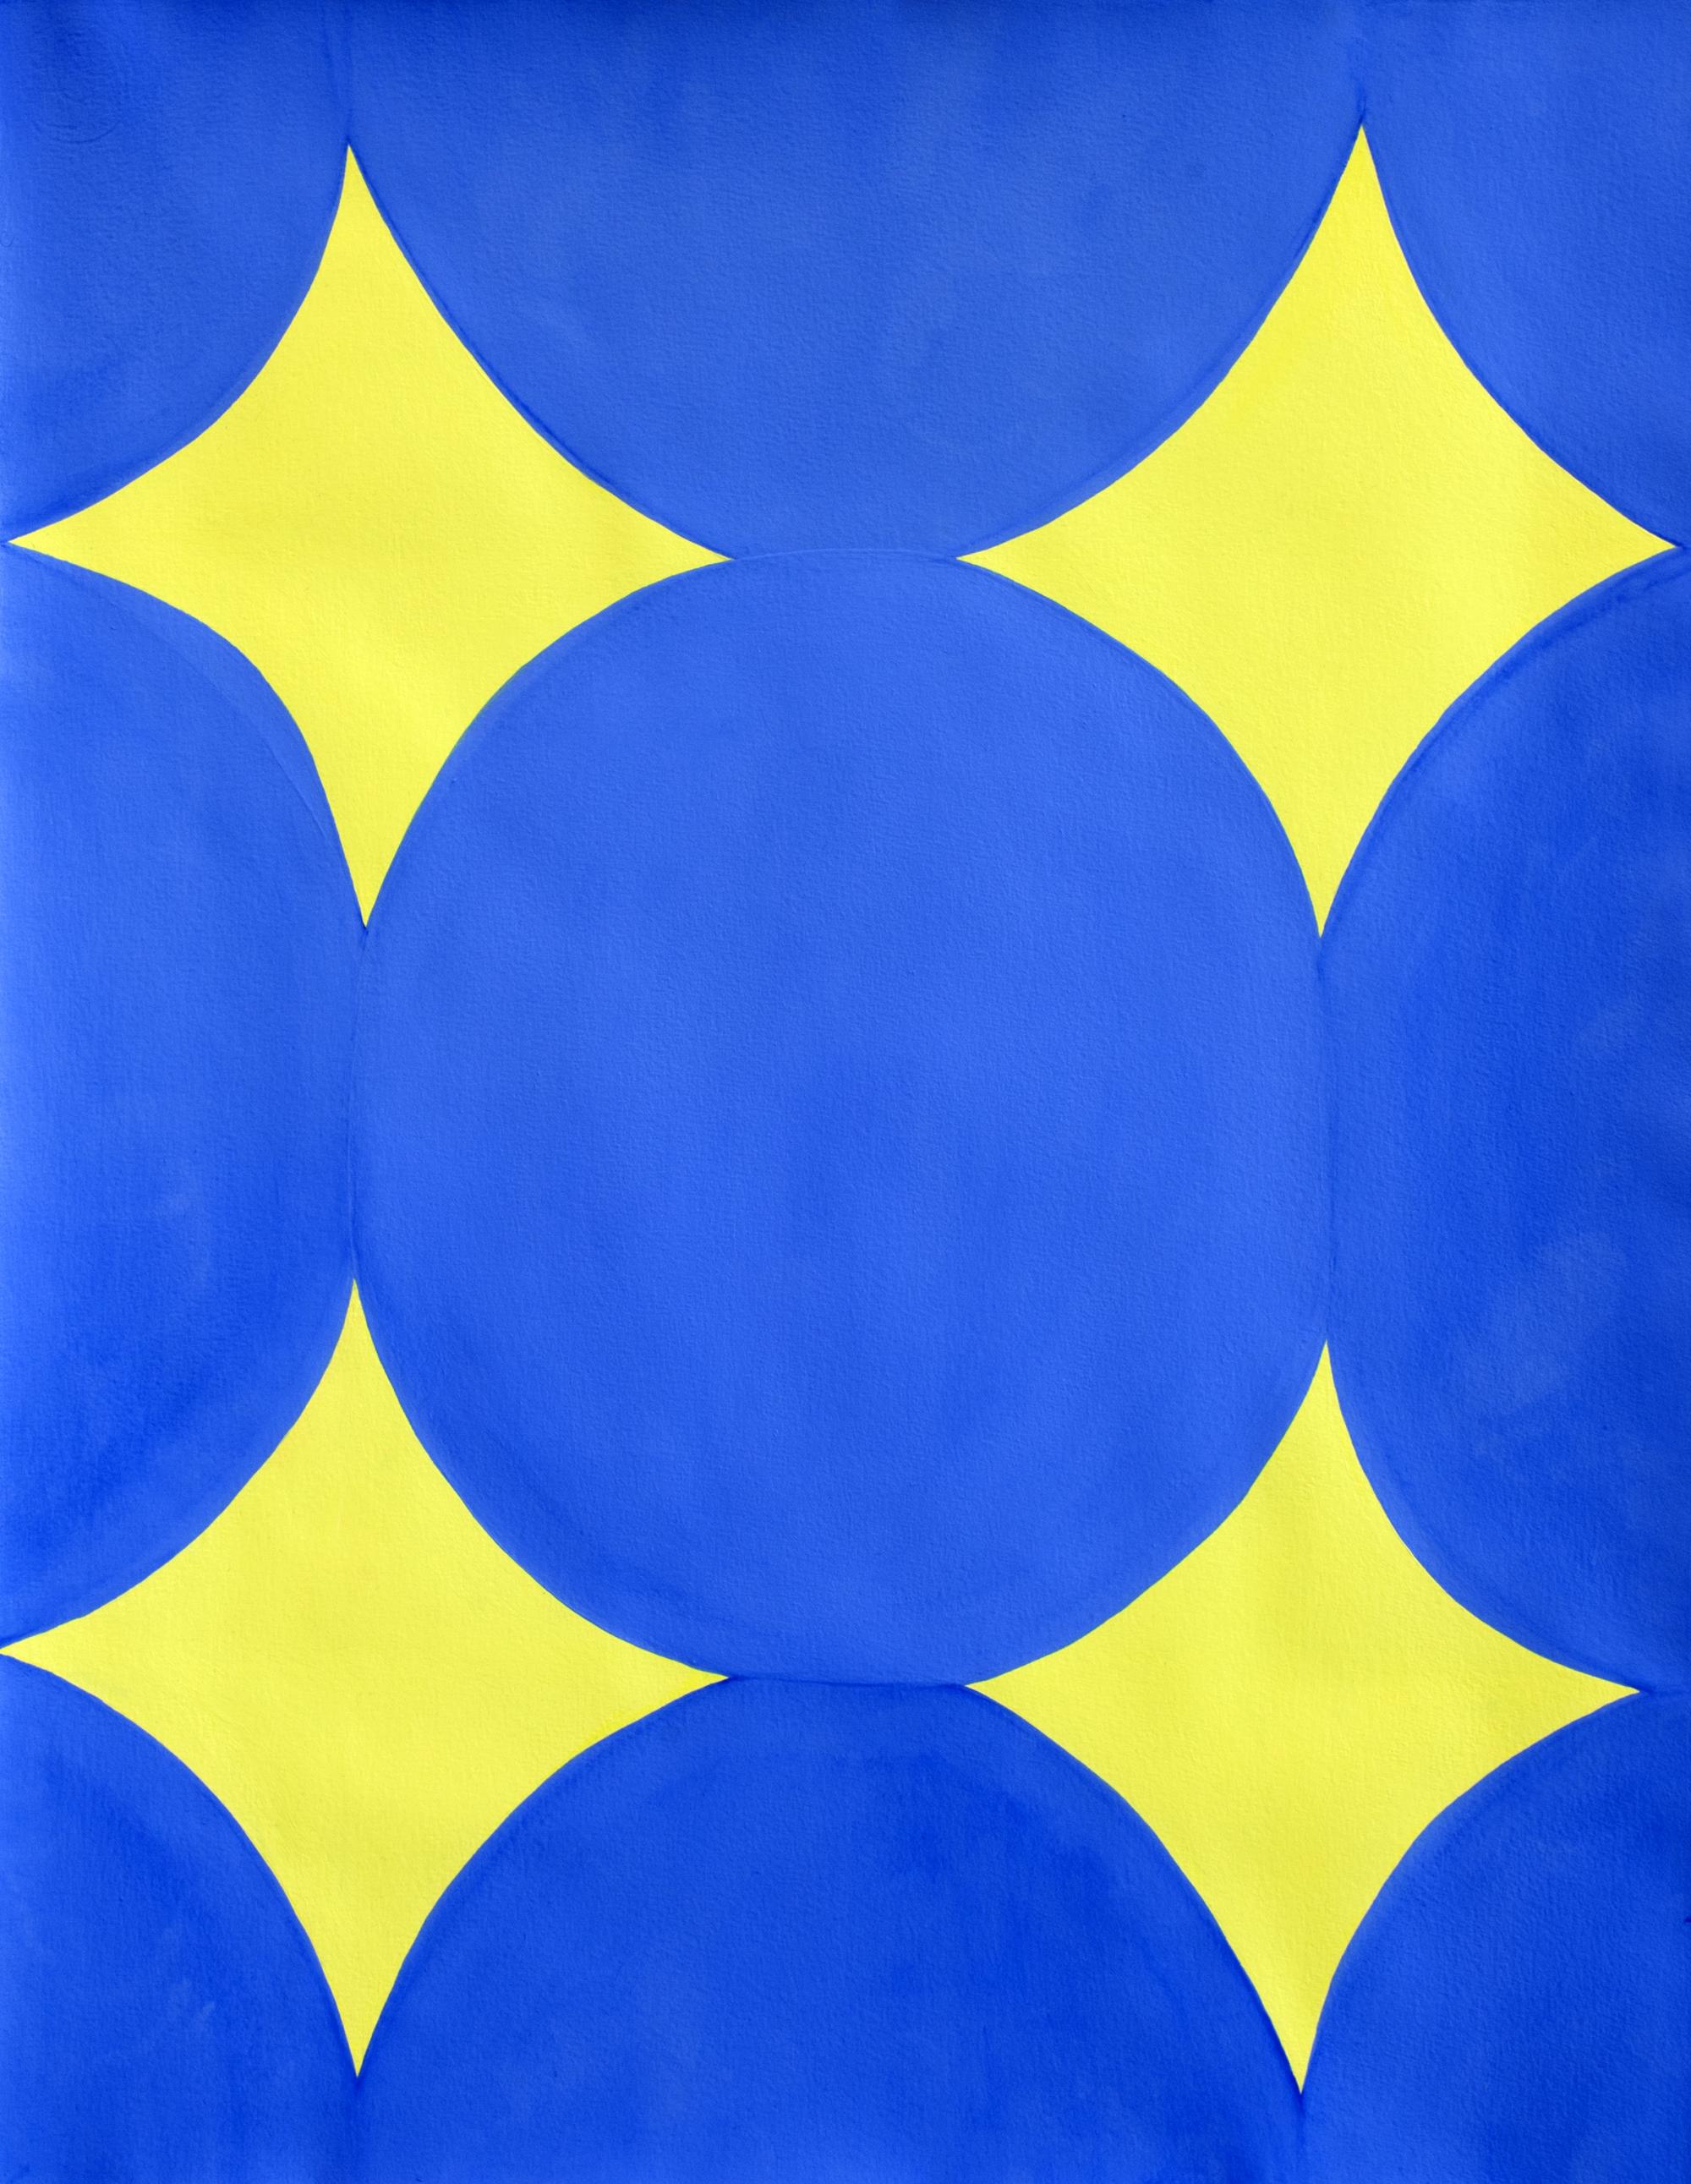 Untitled, 2011, gouache on paper, 31 x 43 cm